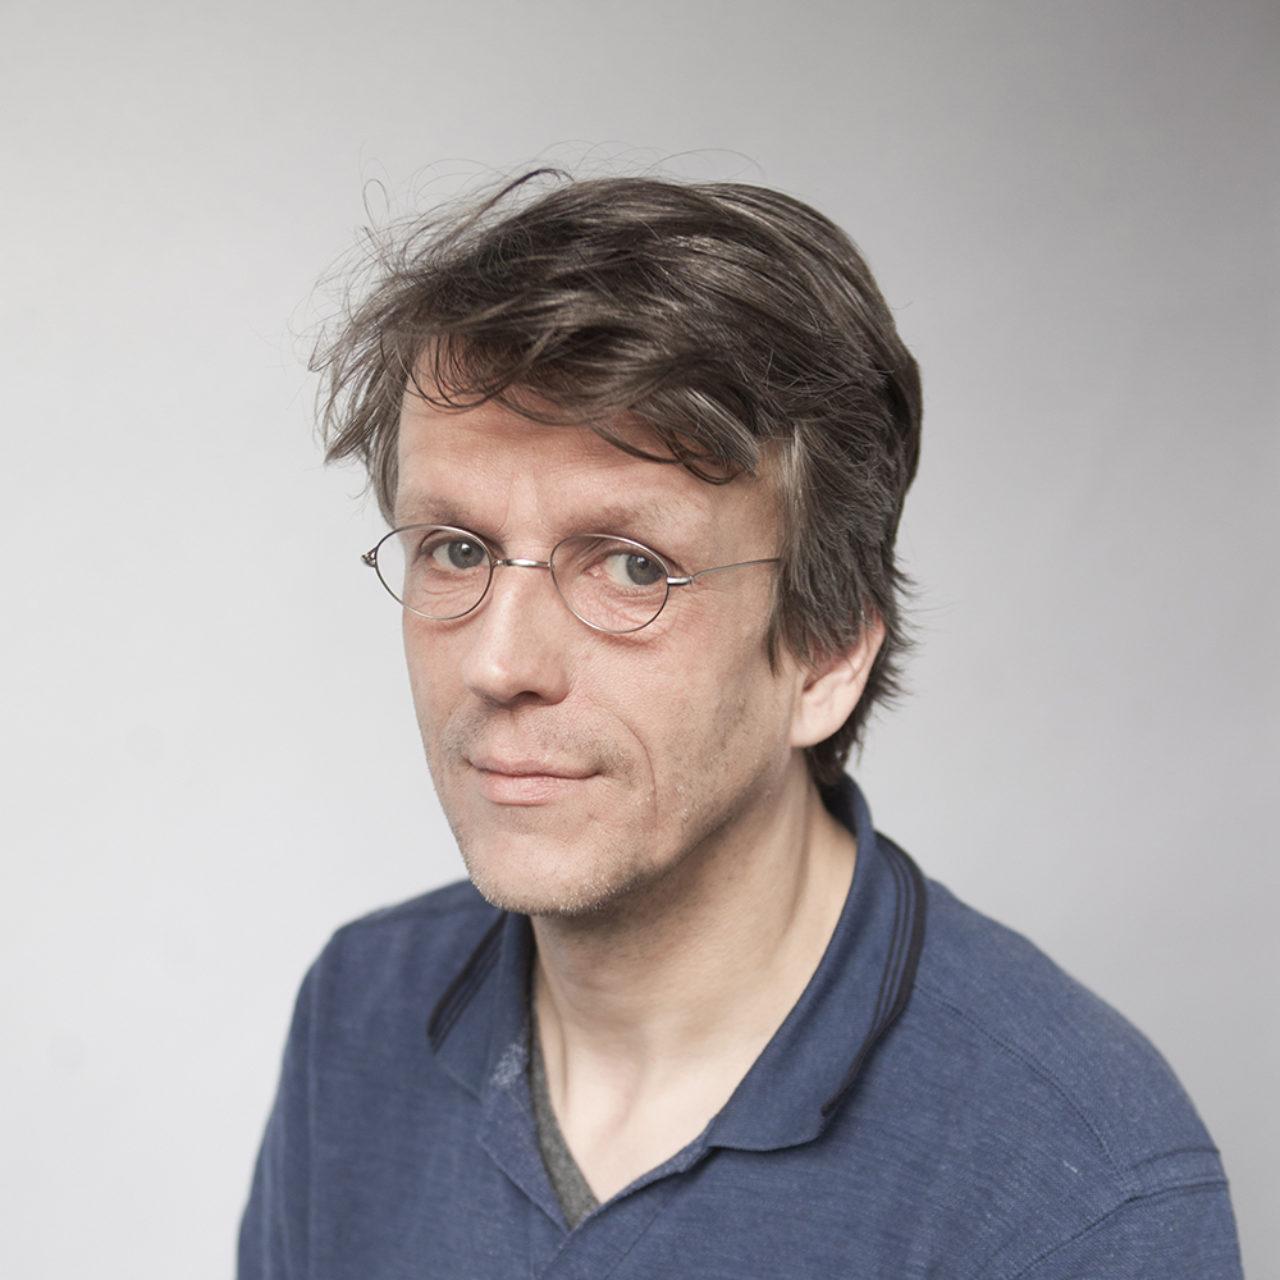 Profile photo Erik Van Blokland, Head of Master Type and Media at the Royal Academy of Art, The Hague